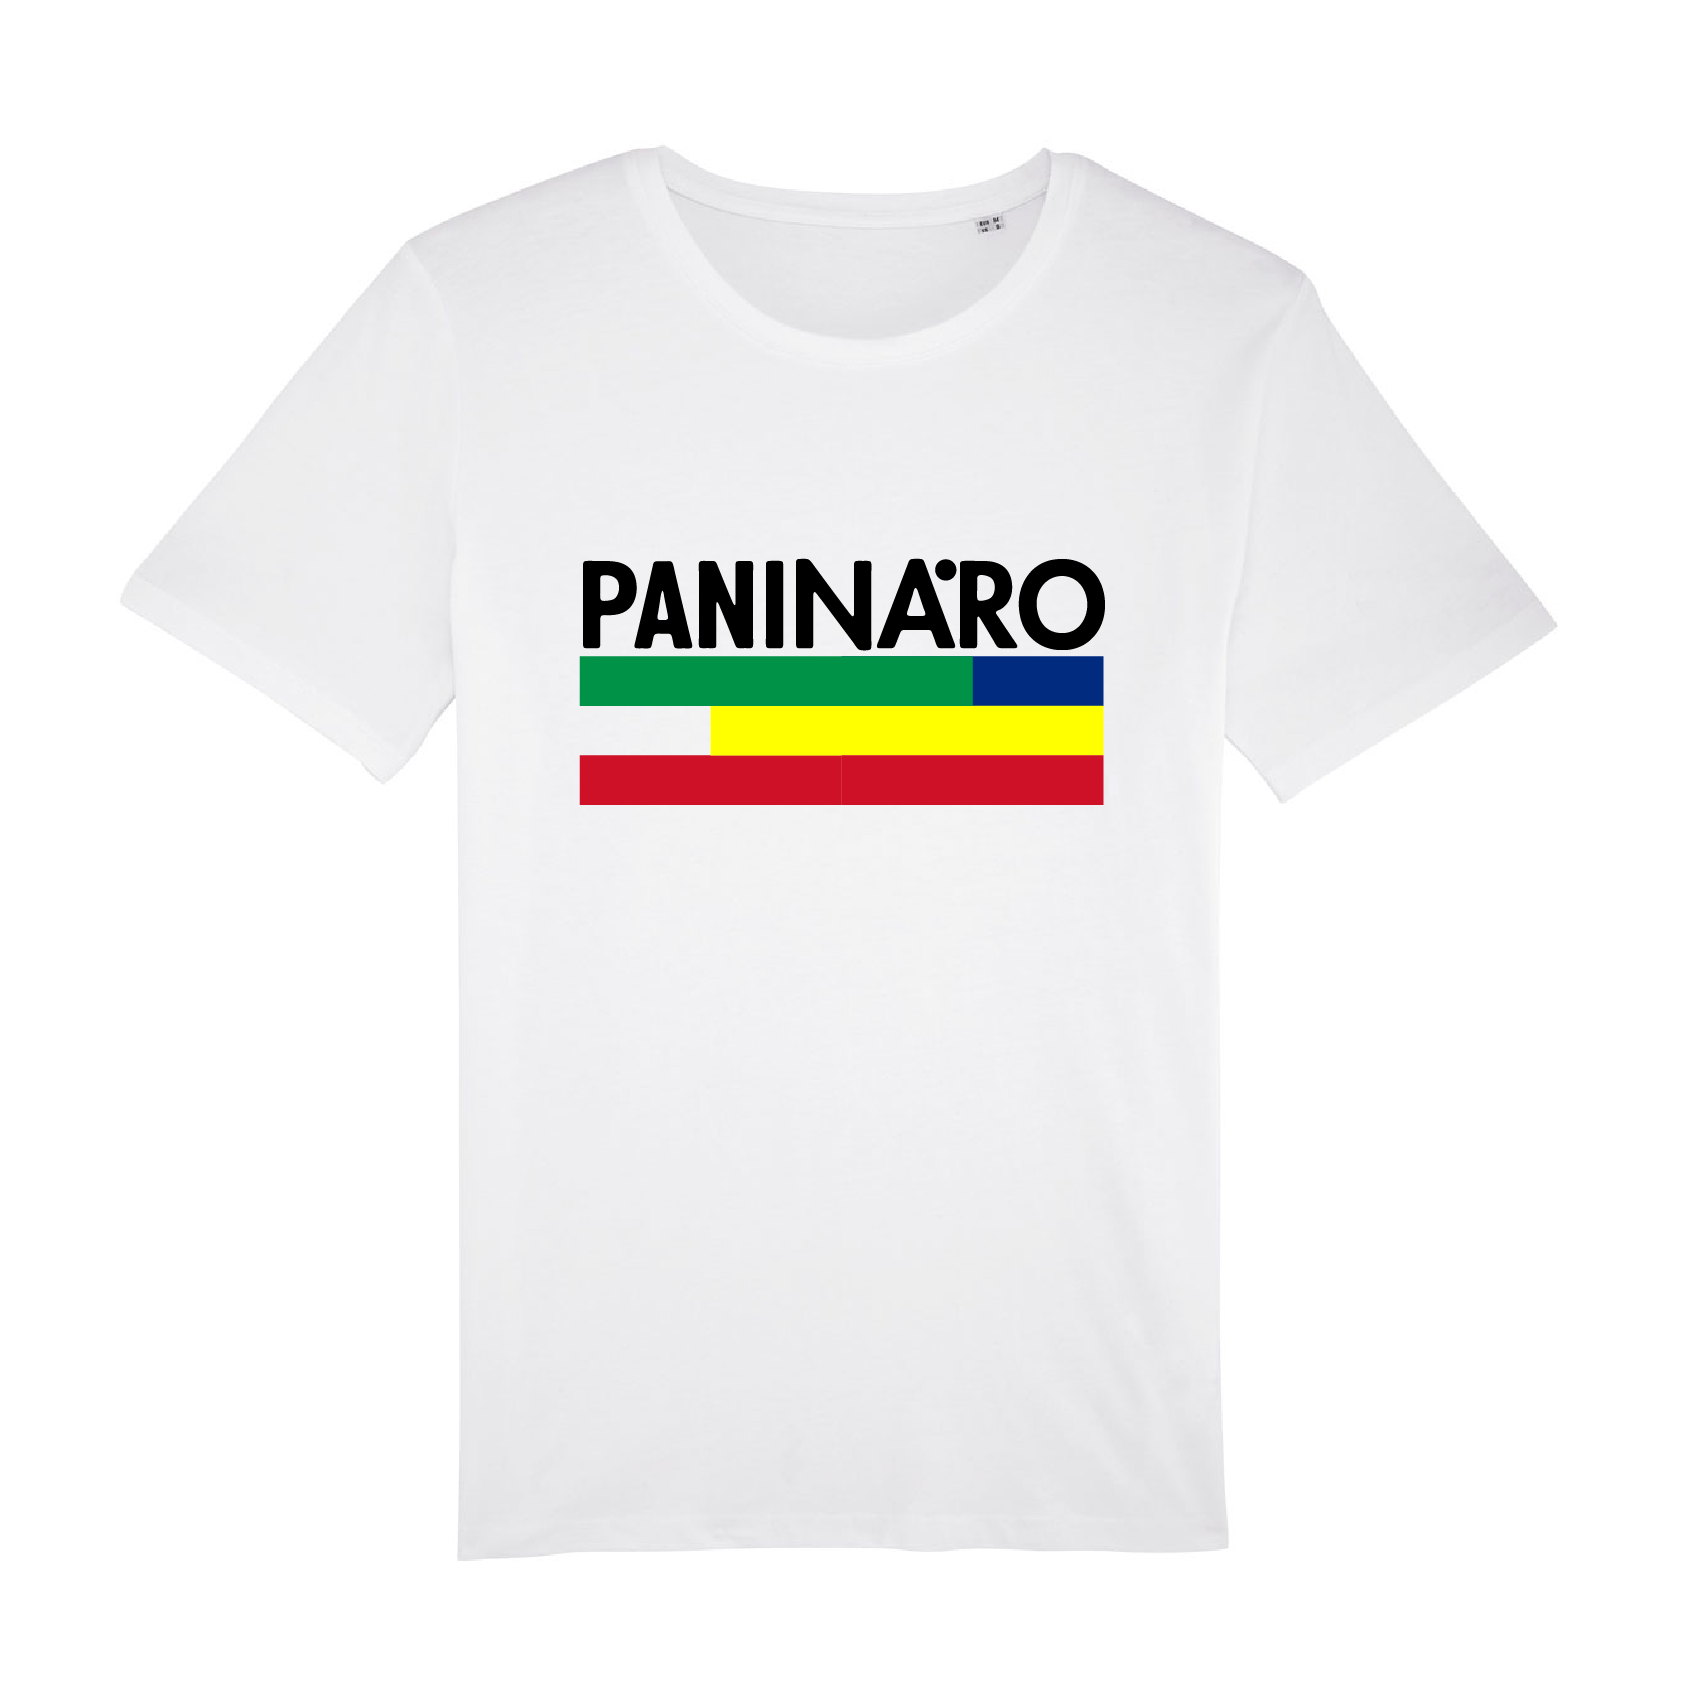 paninaroArtboard 3.png